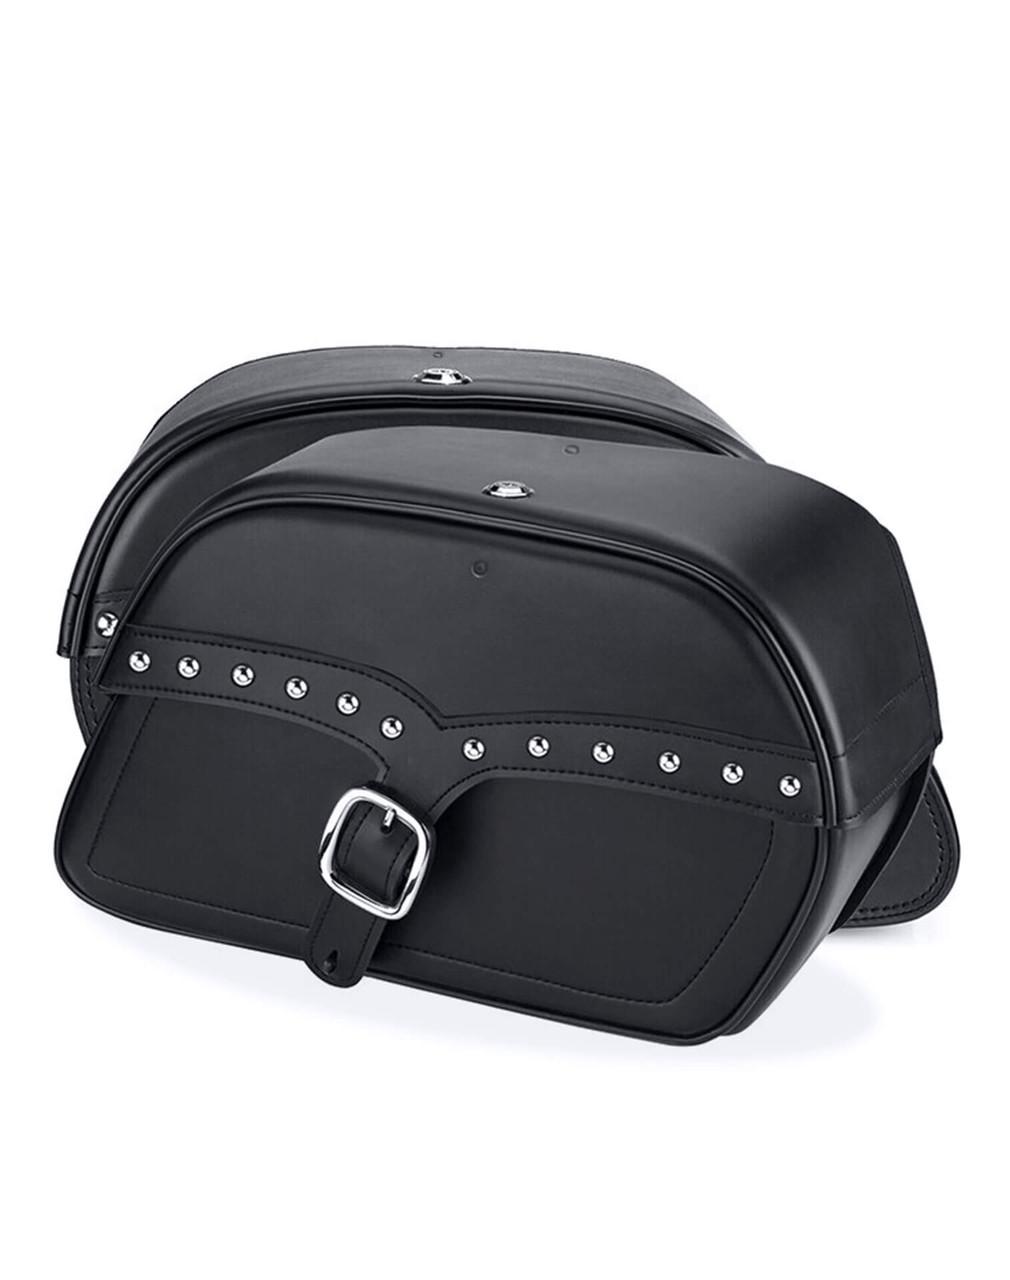 Yamaha Startoliner XV 1900 Large Charger Single Strap Studded Motorcycle Saddlebags Both Bags View